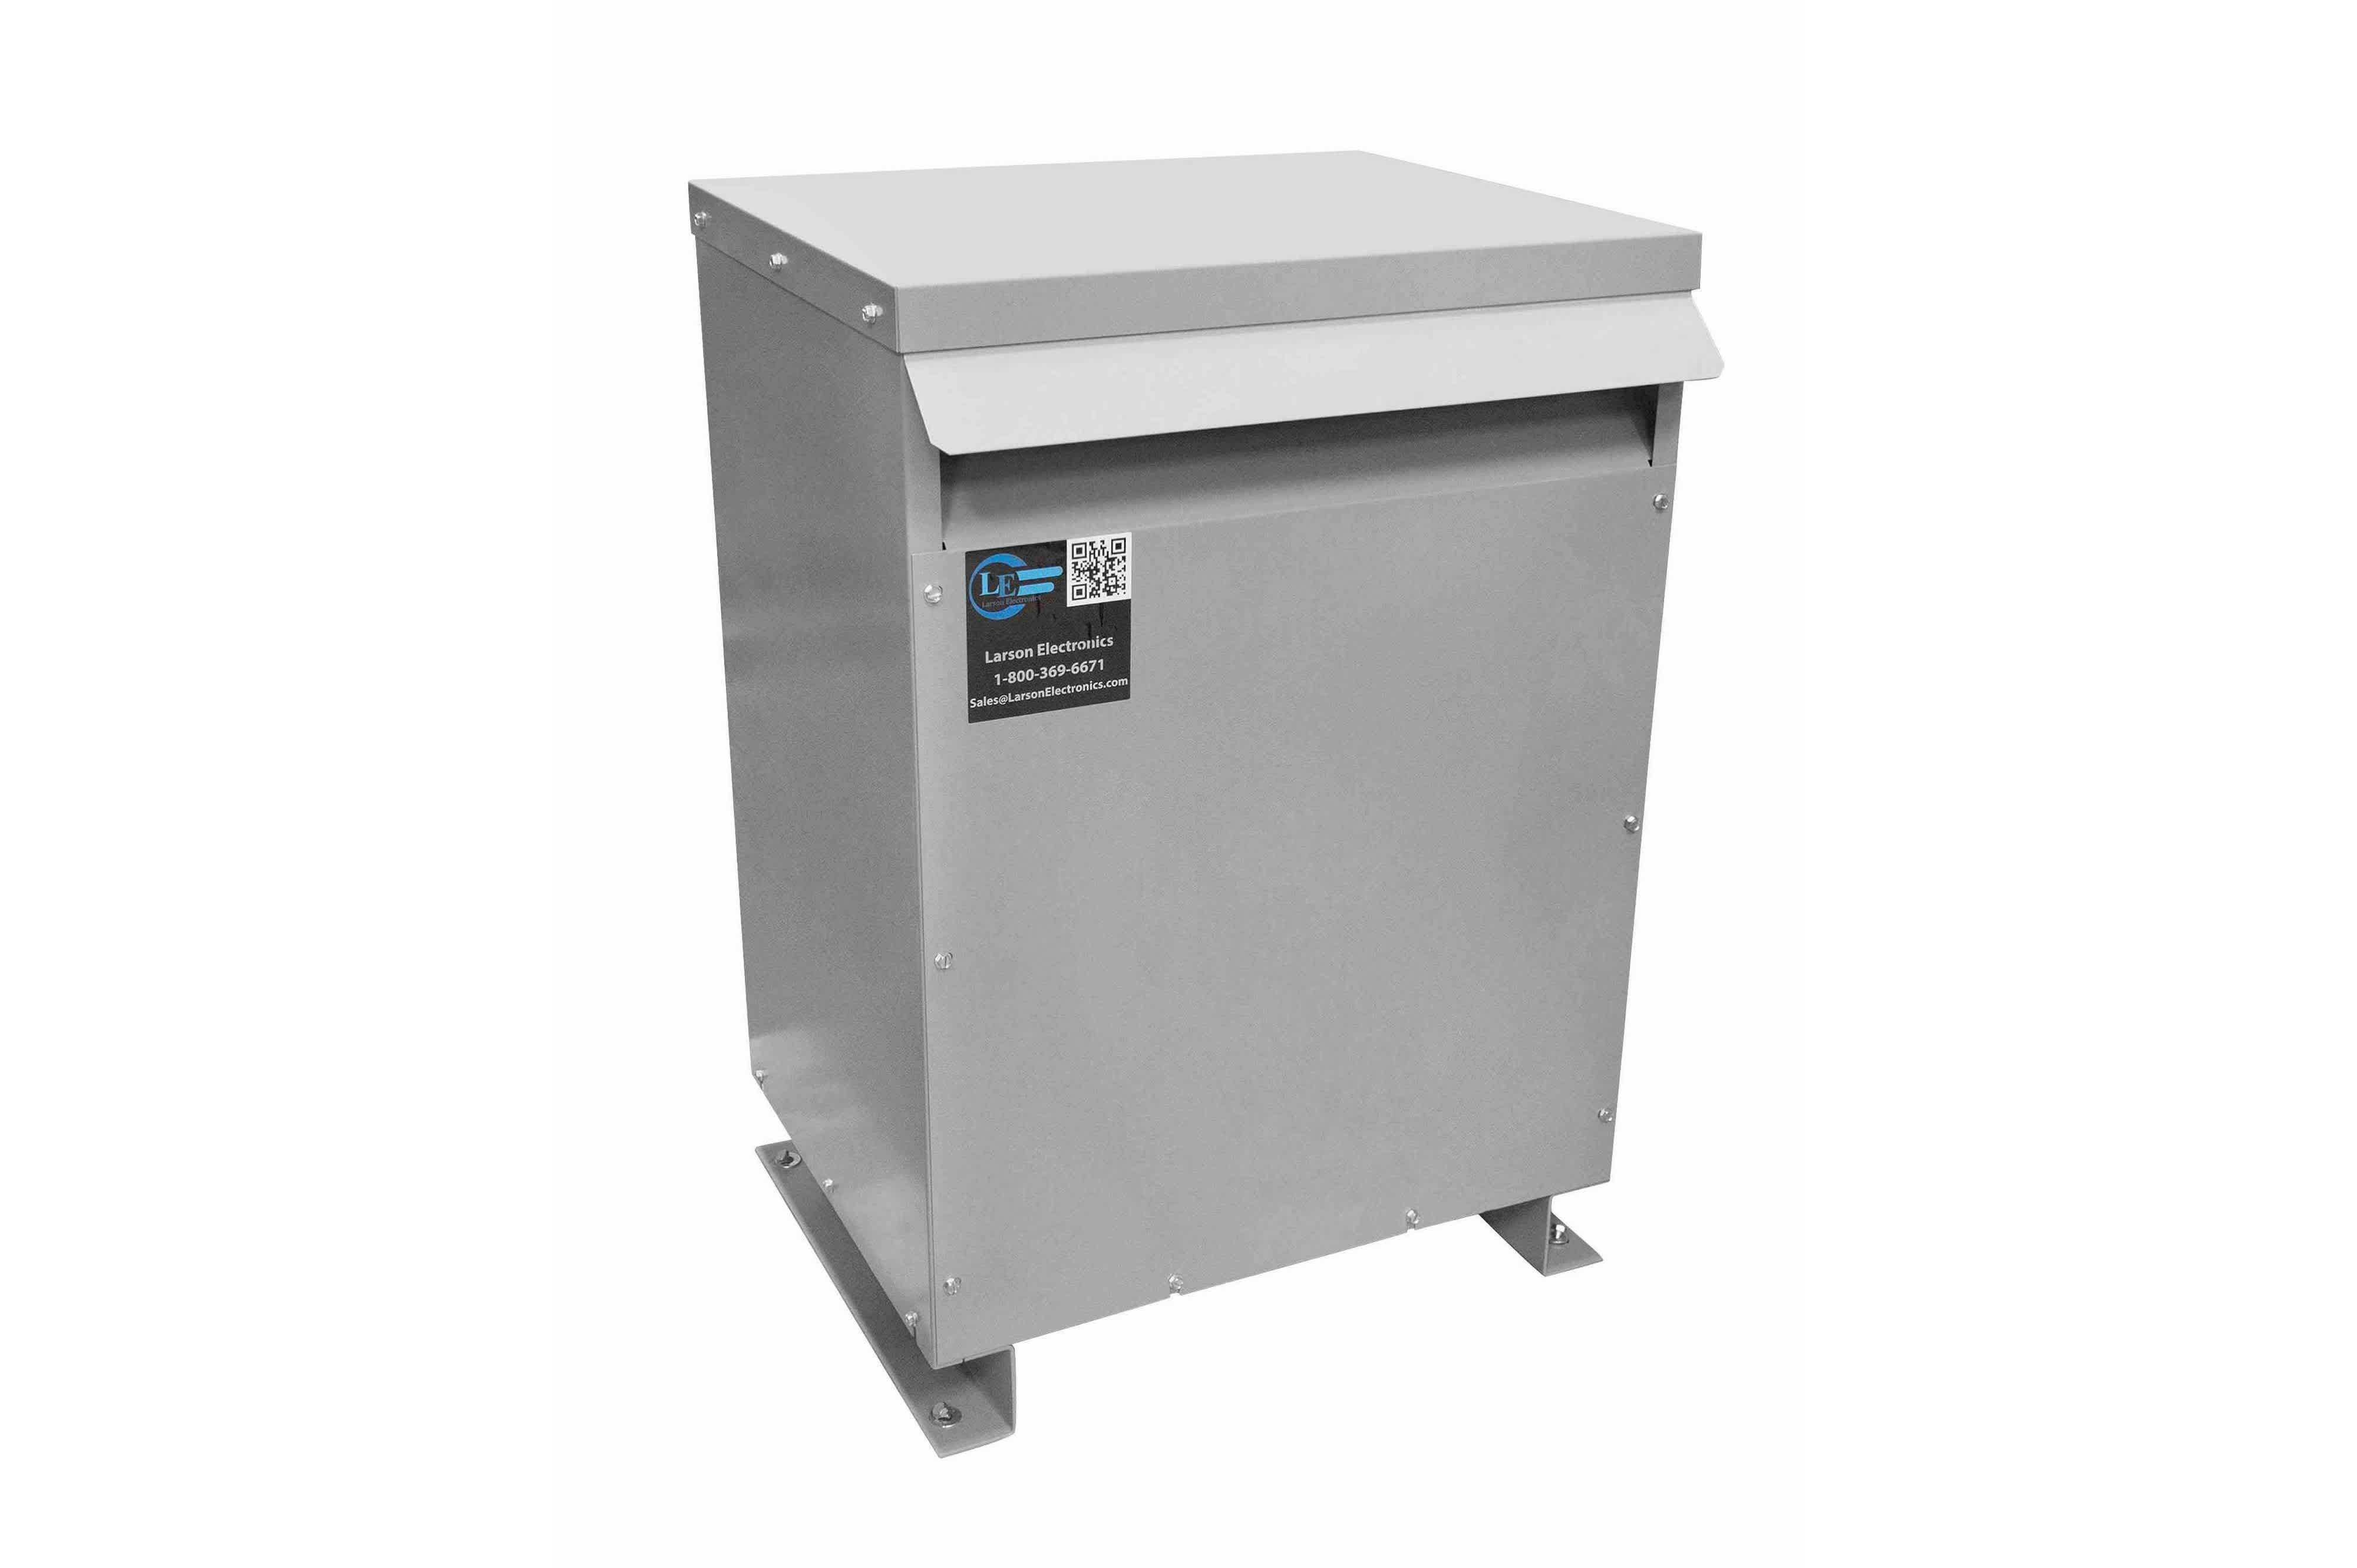 300 kVA 3PH DOE Transformer, 460V Delta Primary, 208Y/120 Wye-N Secondary, N3R, Ventilated, 60 Hz